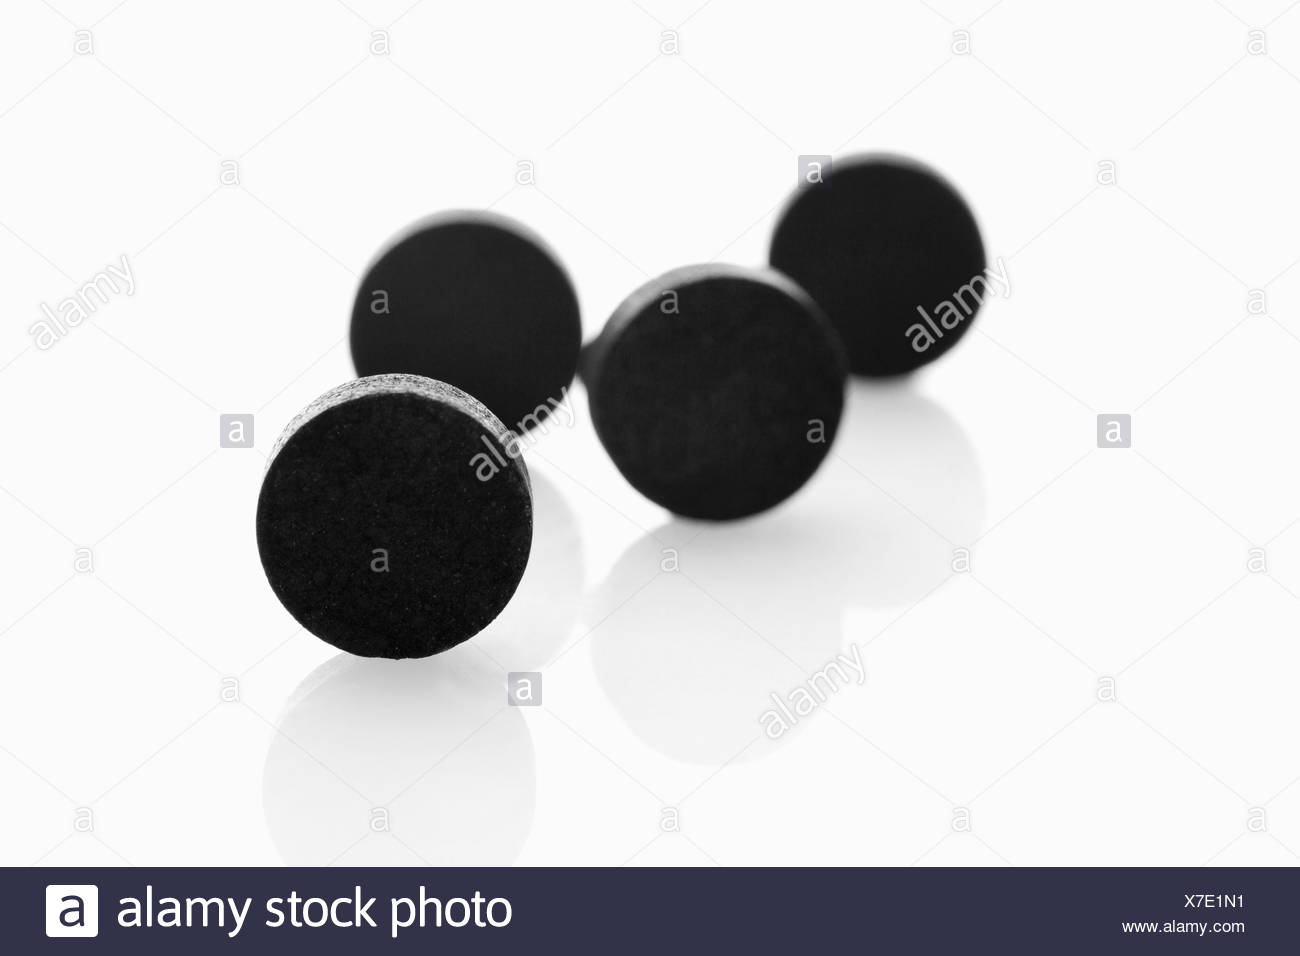 Black tablets on white background - Stock Image